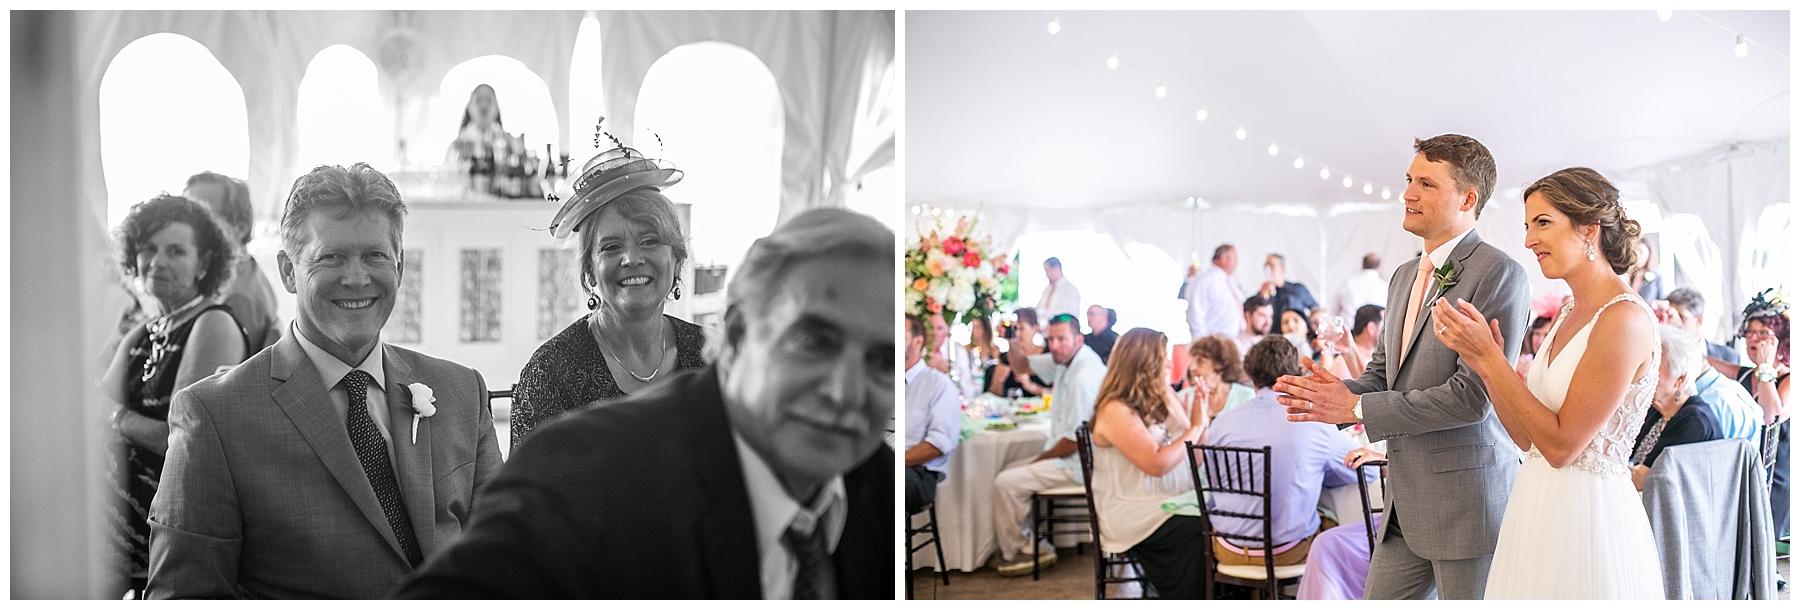 Chelsea Phil Bohemia River Overlook Wedding Living Radiant Photography photos_0148.jpg